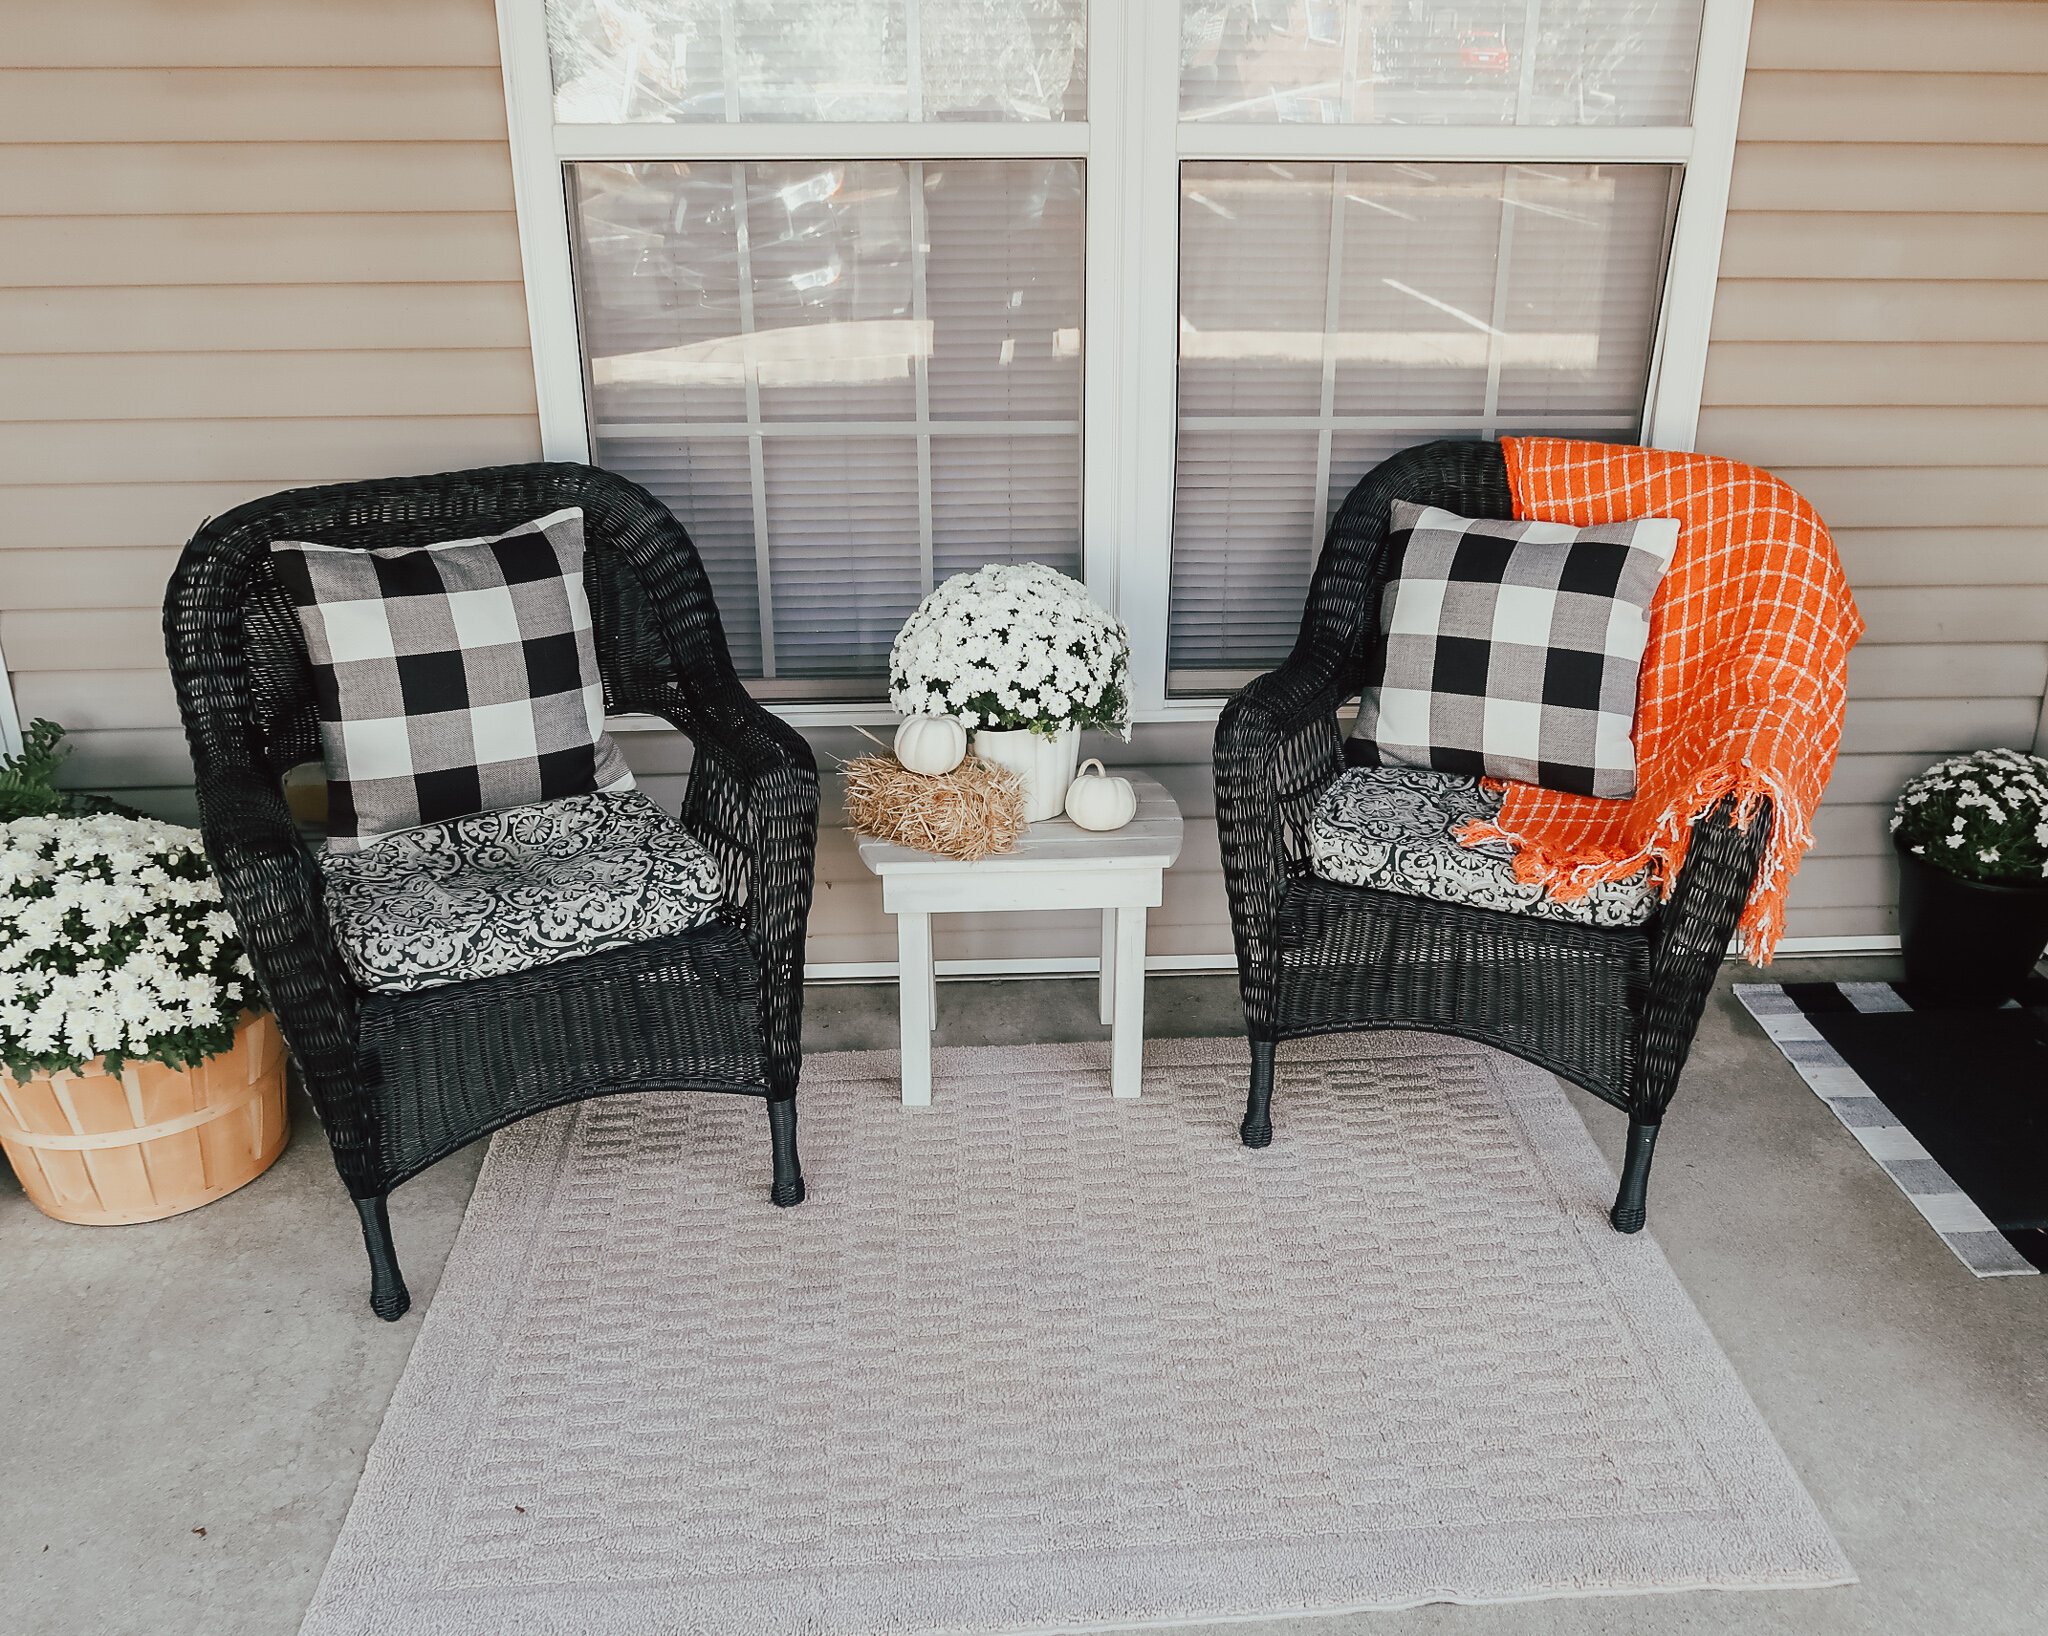 fall-front-porch-decor-12.jpg